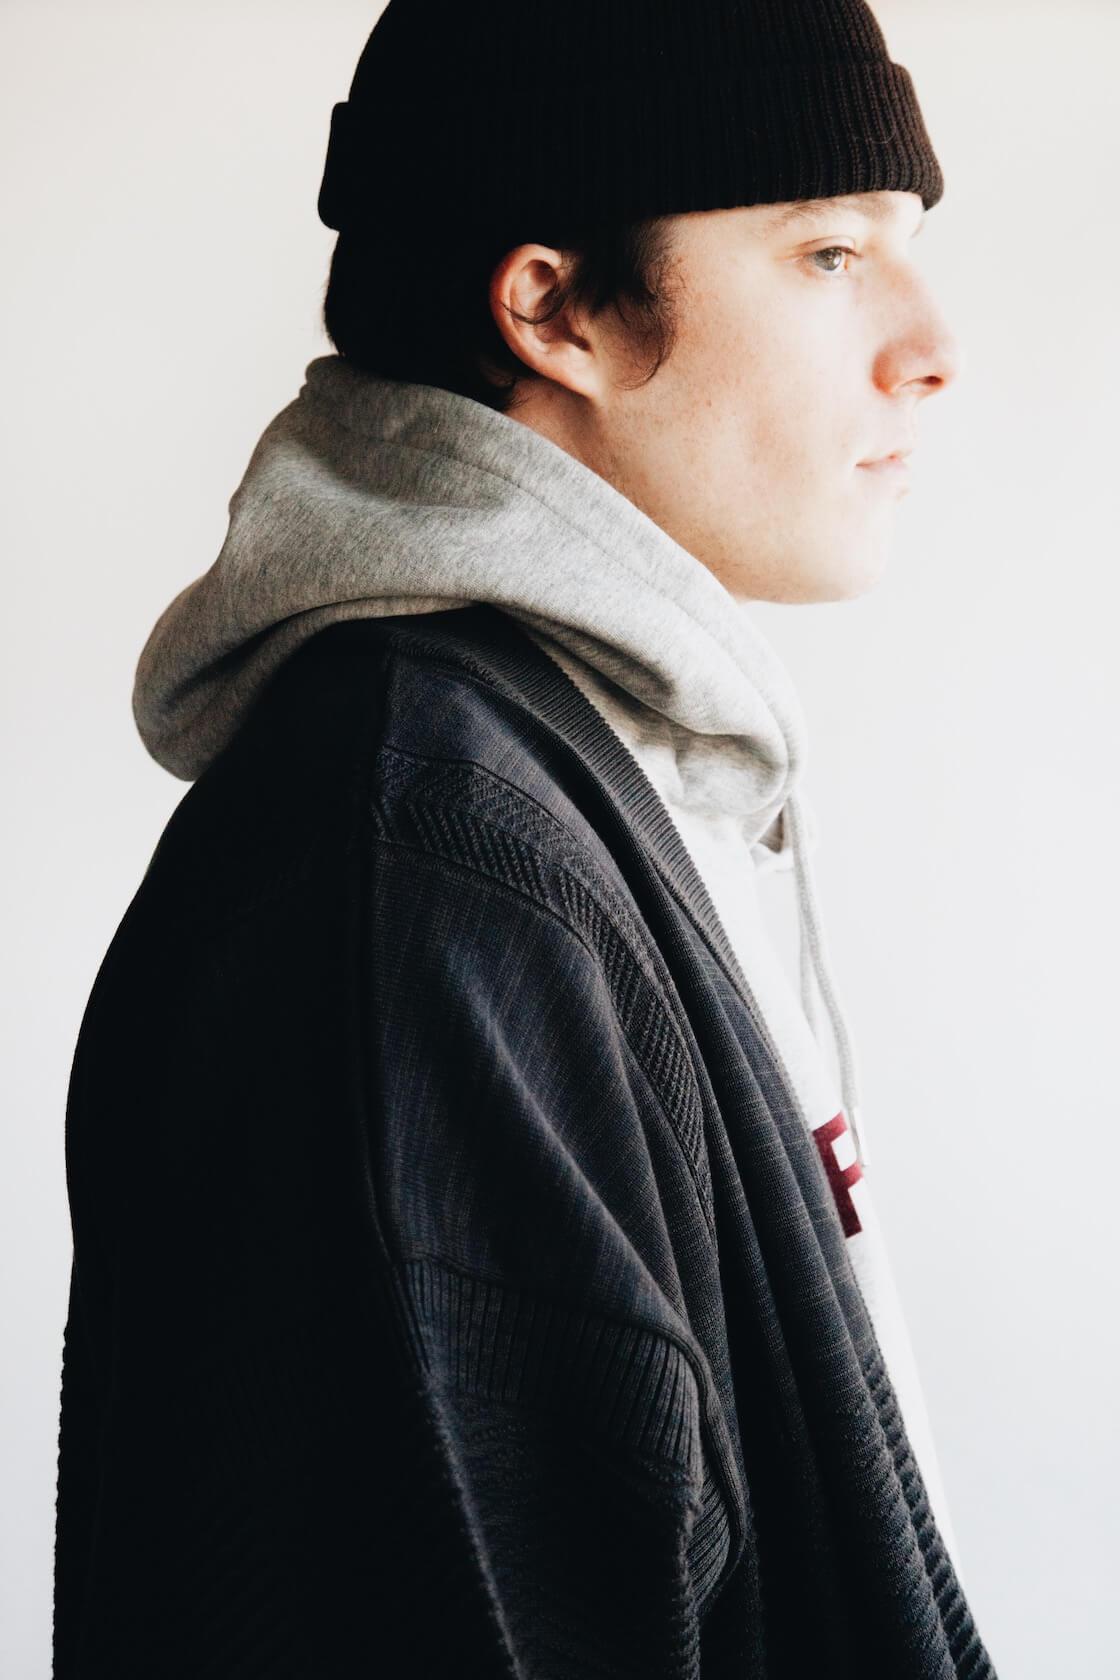 Shunto Hanten Knit from Yashiki, Sany Velour Sweatshirt from Harmony on body